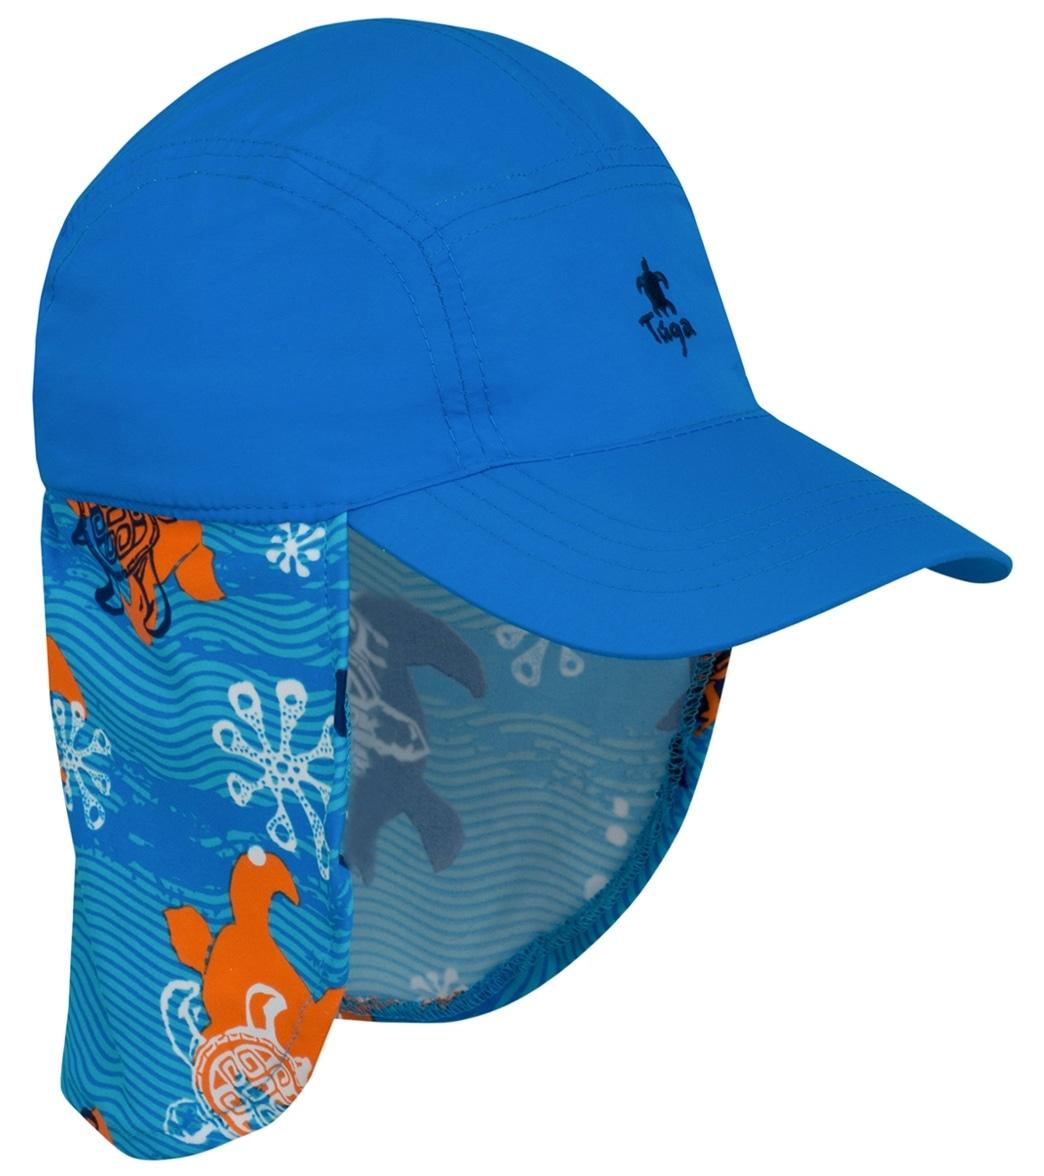 UV Sun Protection Summer Beach Legionnaire Hat Neck Flap Kids Boys Girls UPF 50